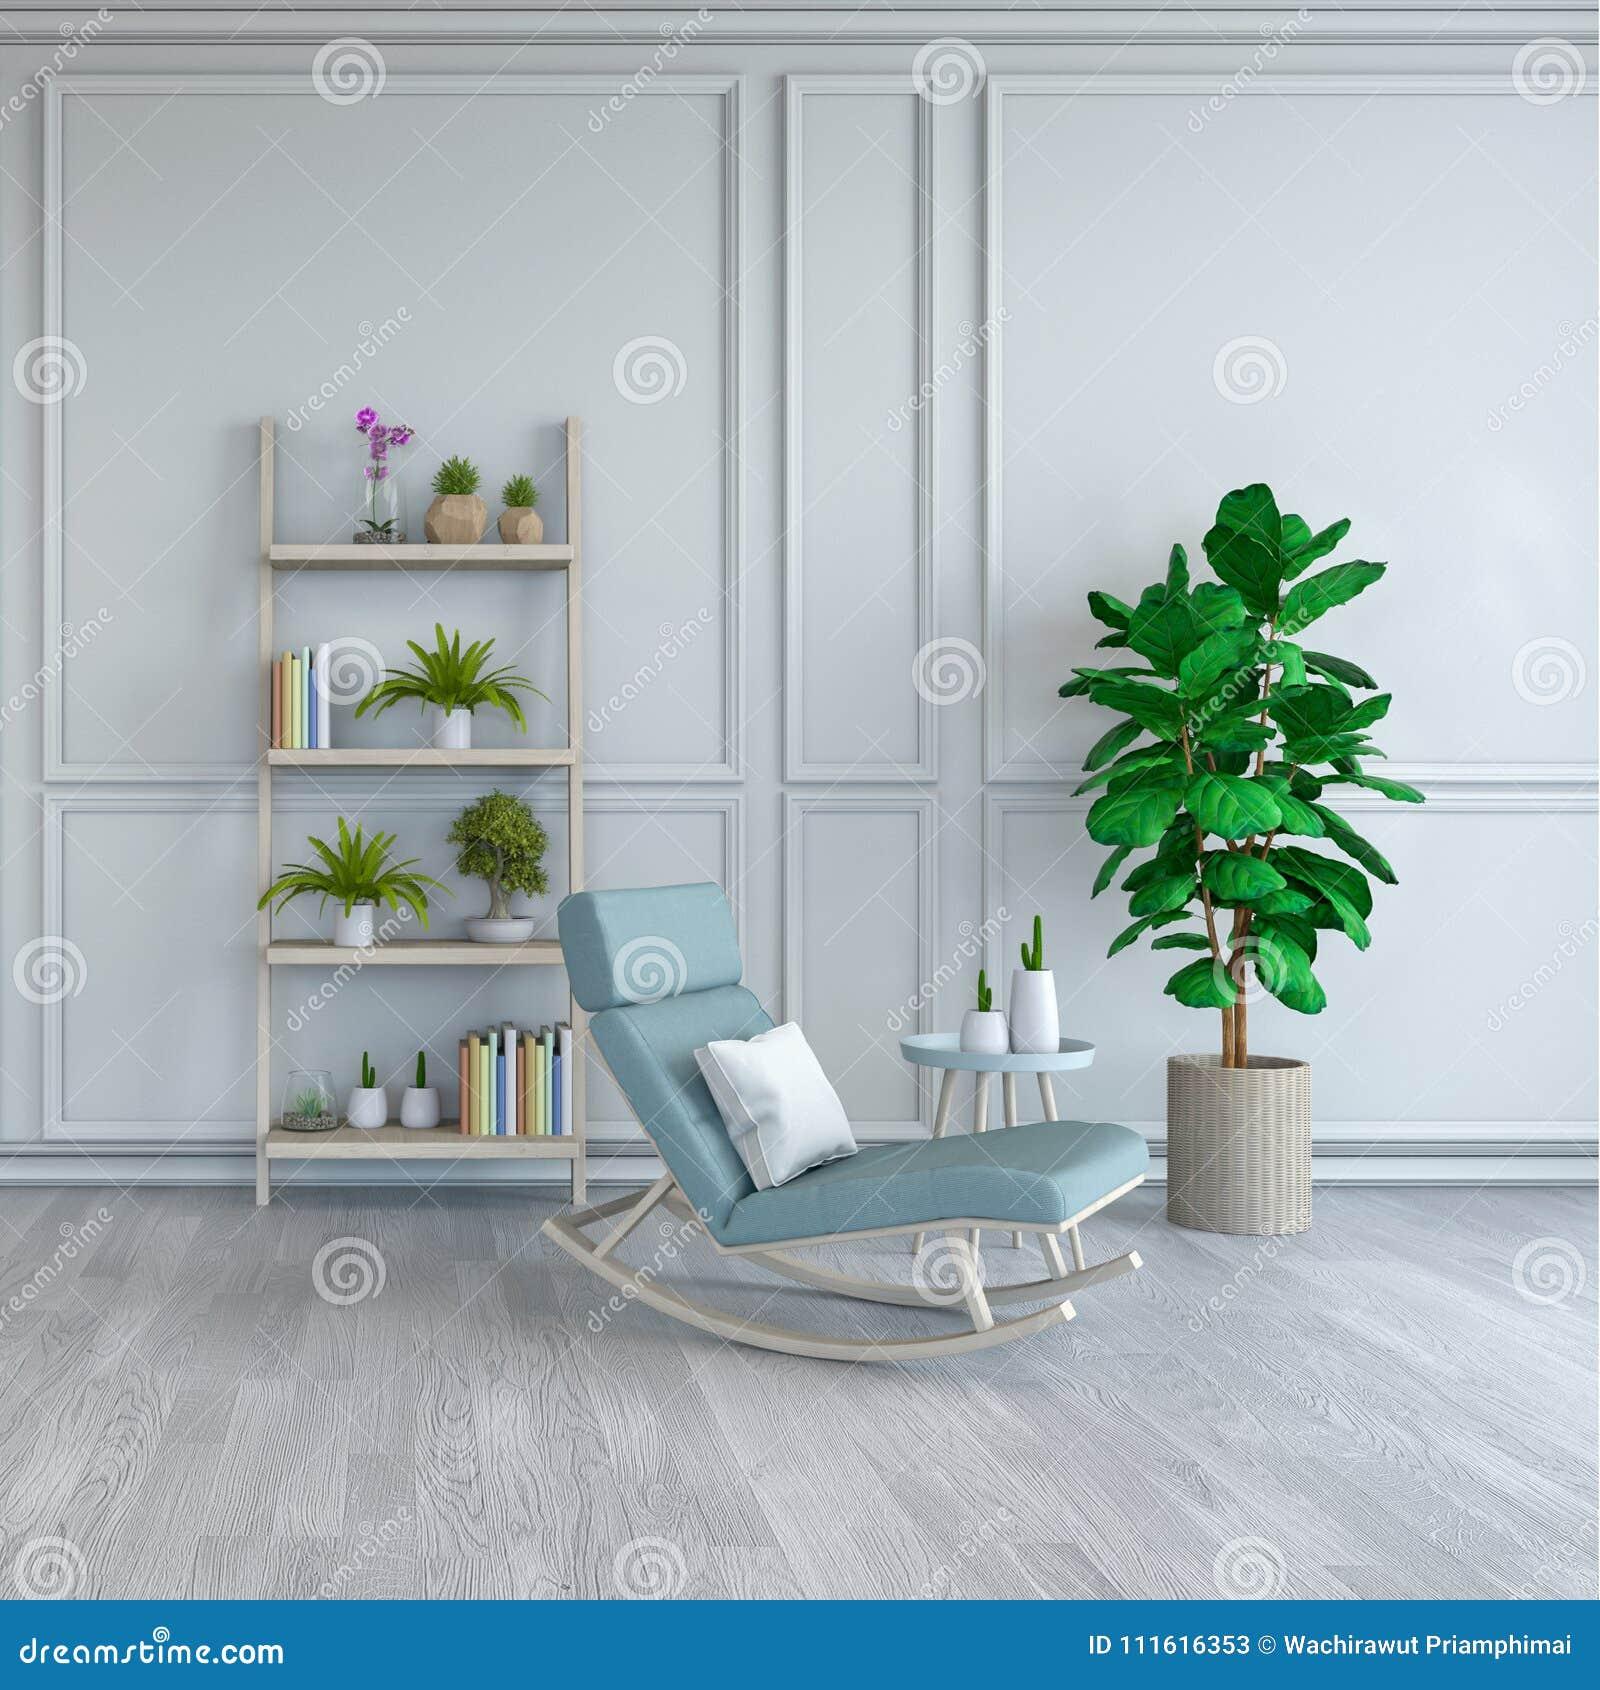 Minimalist Room Interior Design Light Blue Lounge Chair